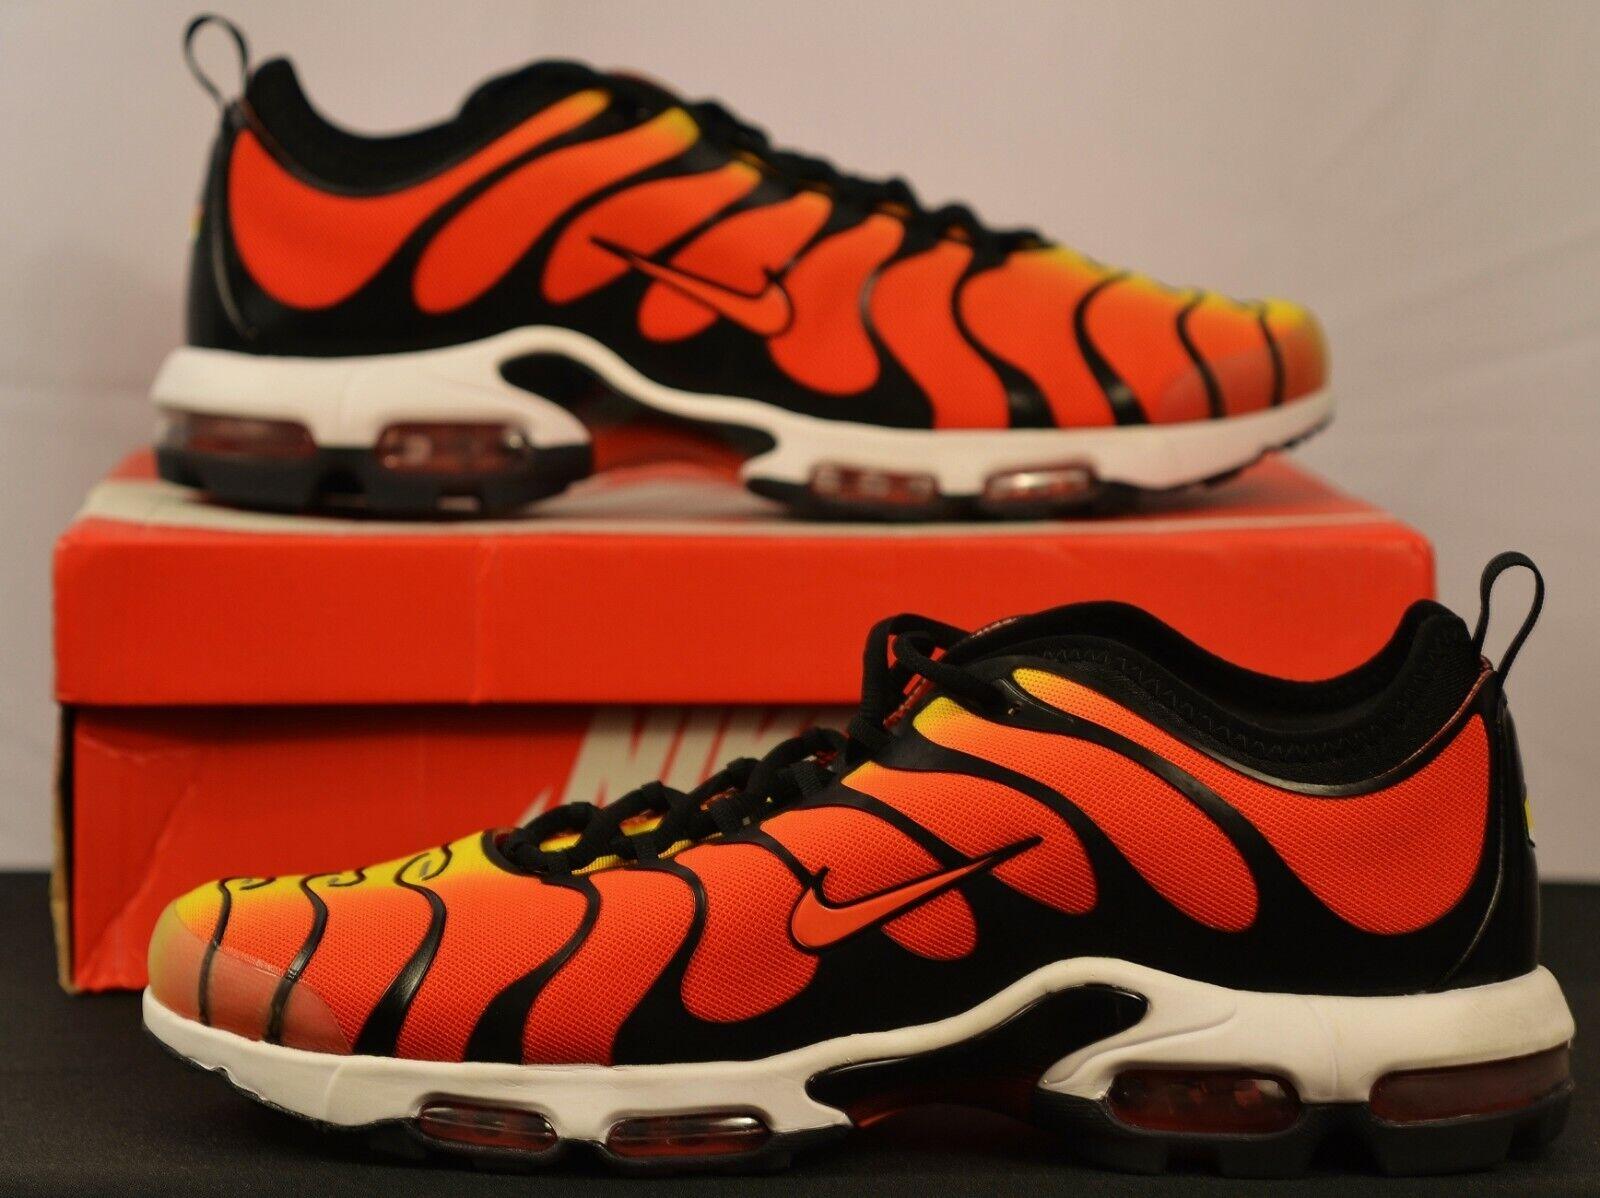 Nike Air Max Plus TN Ultra Tiger Mens 13 Sneakers Shoes Black Team Orange Yellow